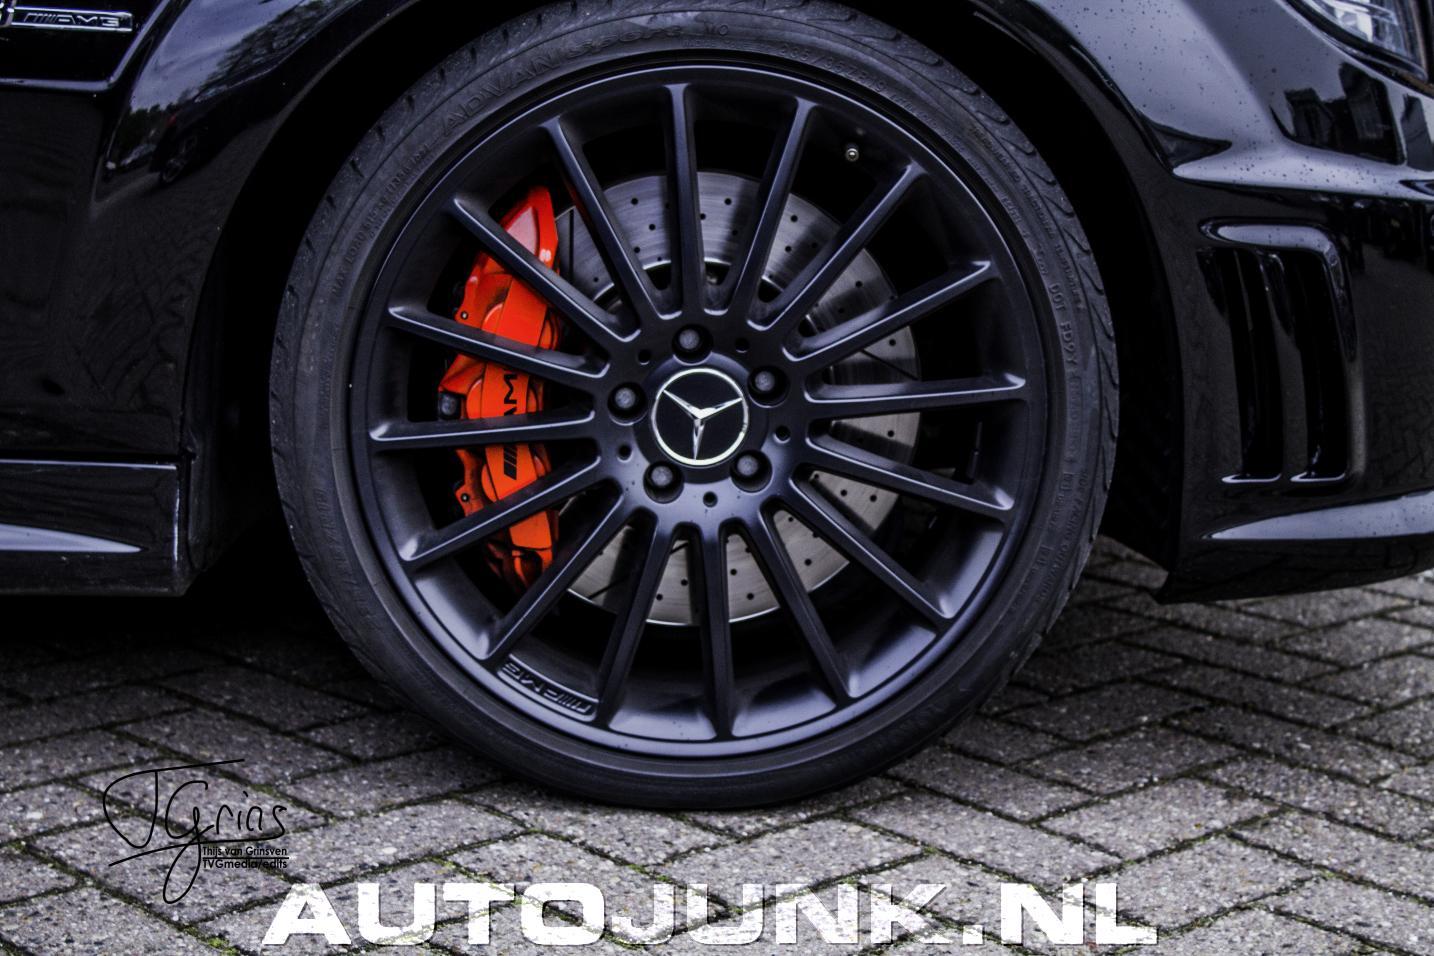 Welke remklauw is het mooiste? foto\'s » Autojunk.nl (115715)